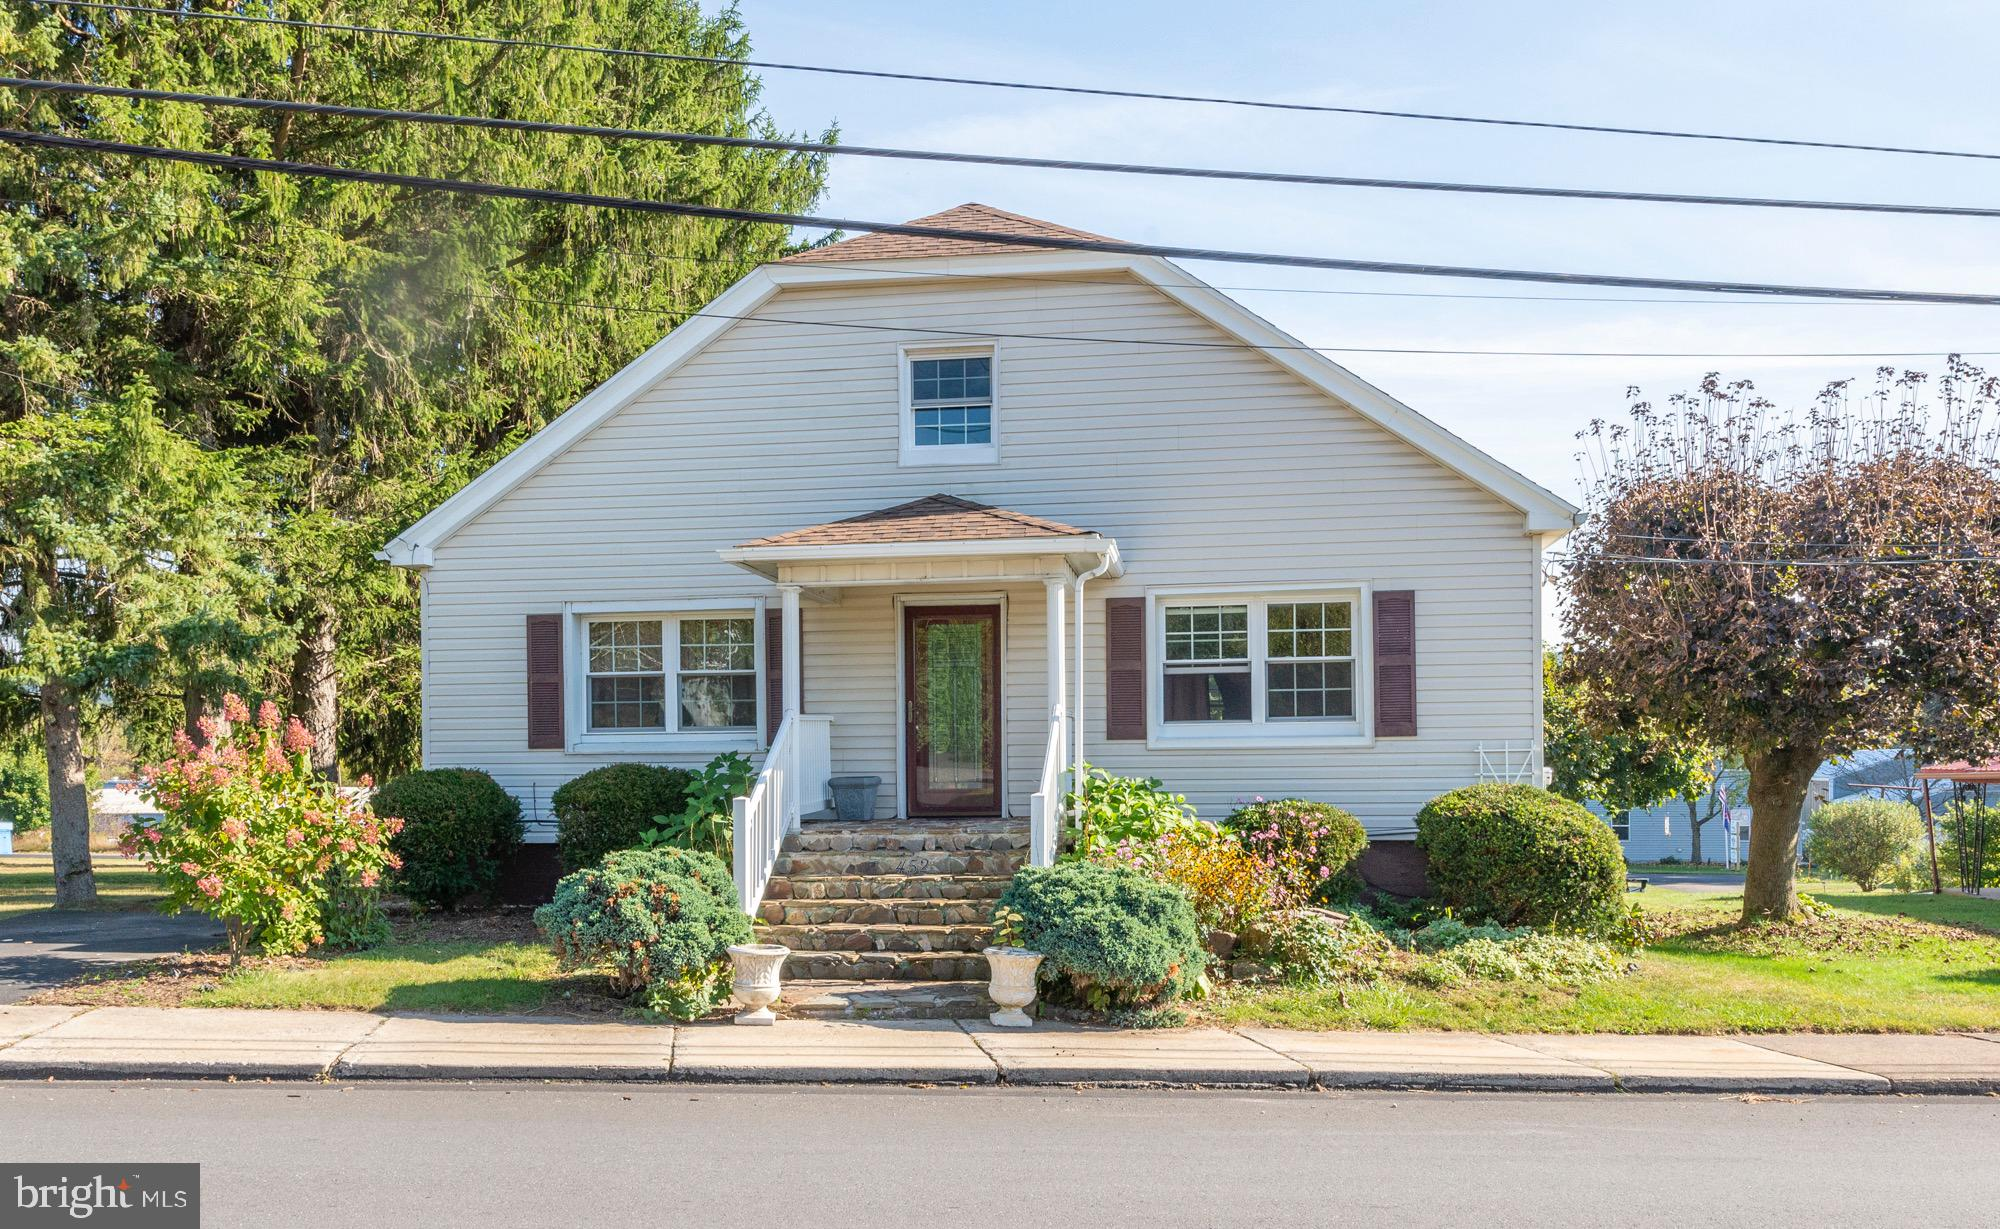 452 W MAIN STREET, RINGTOWN, PA 17967